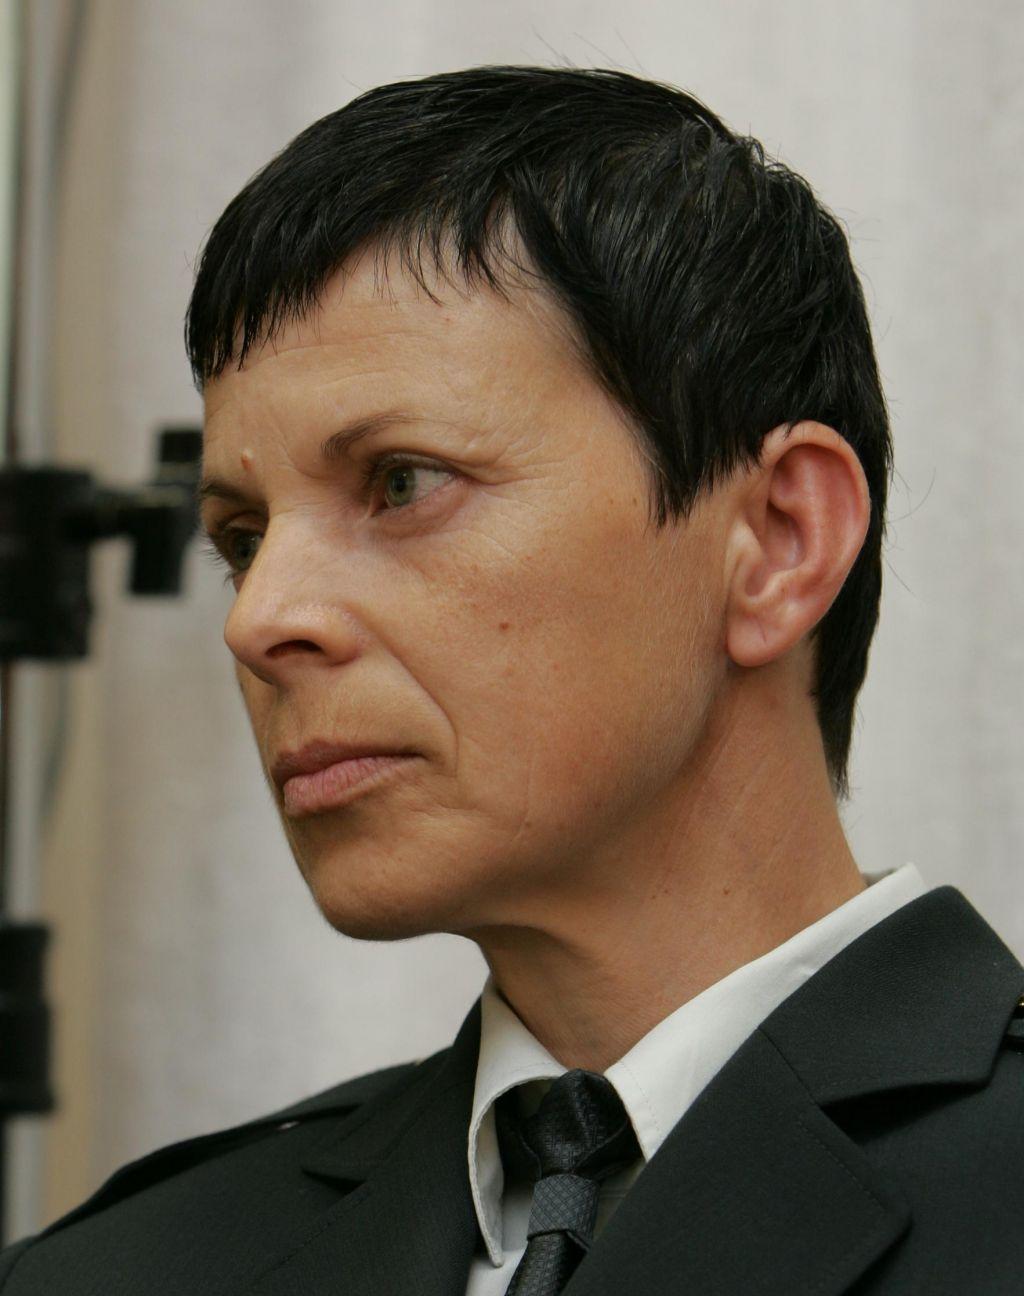 Alenka Ermenc - prva ženska s činom generalmajorke